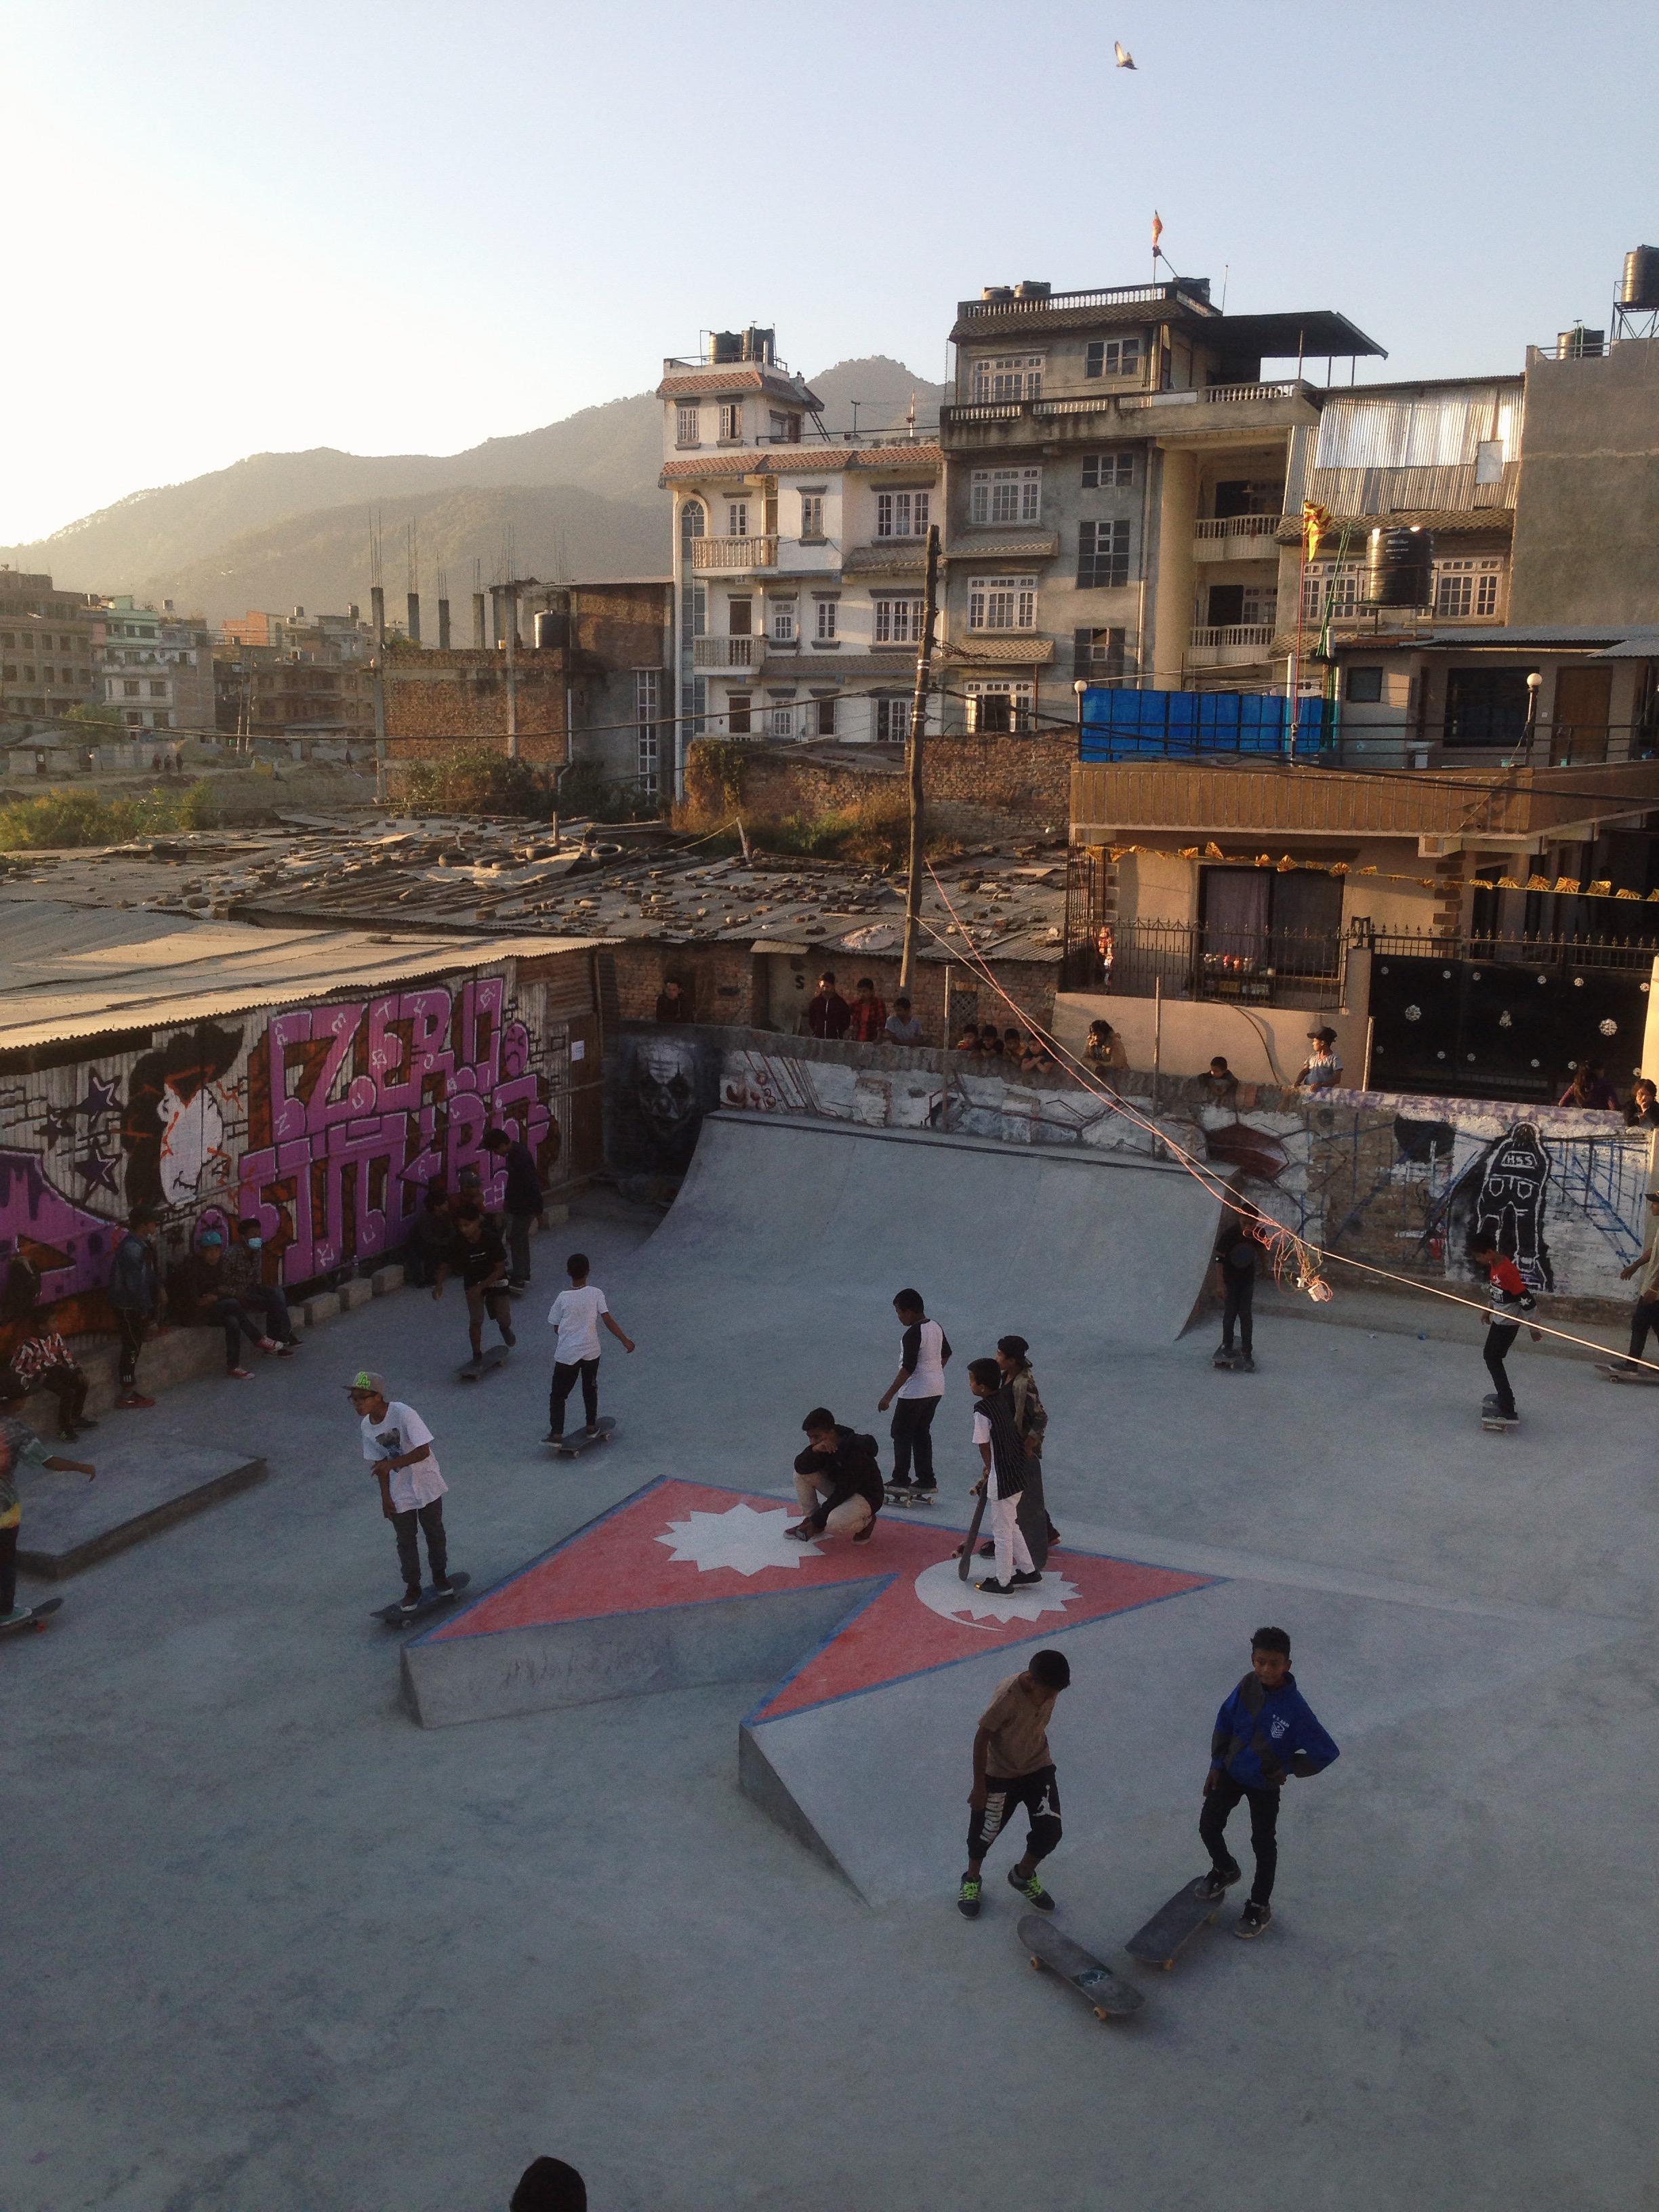 Kathmandu Skatepark, Nepal - Photo: Ben Hermans